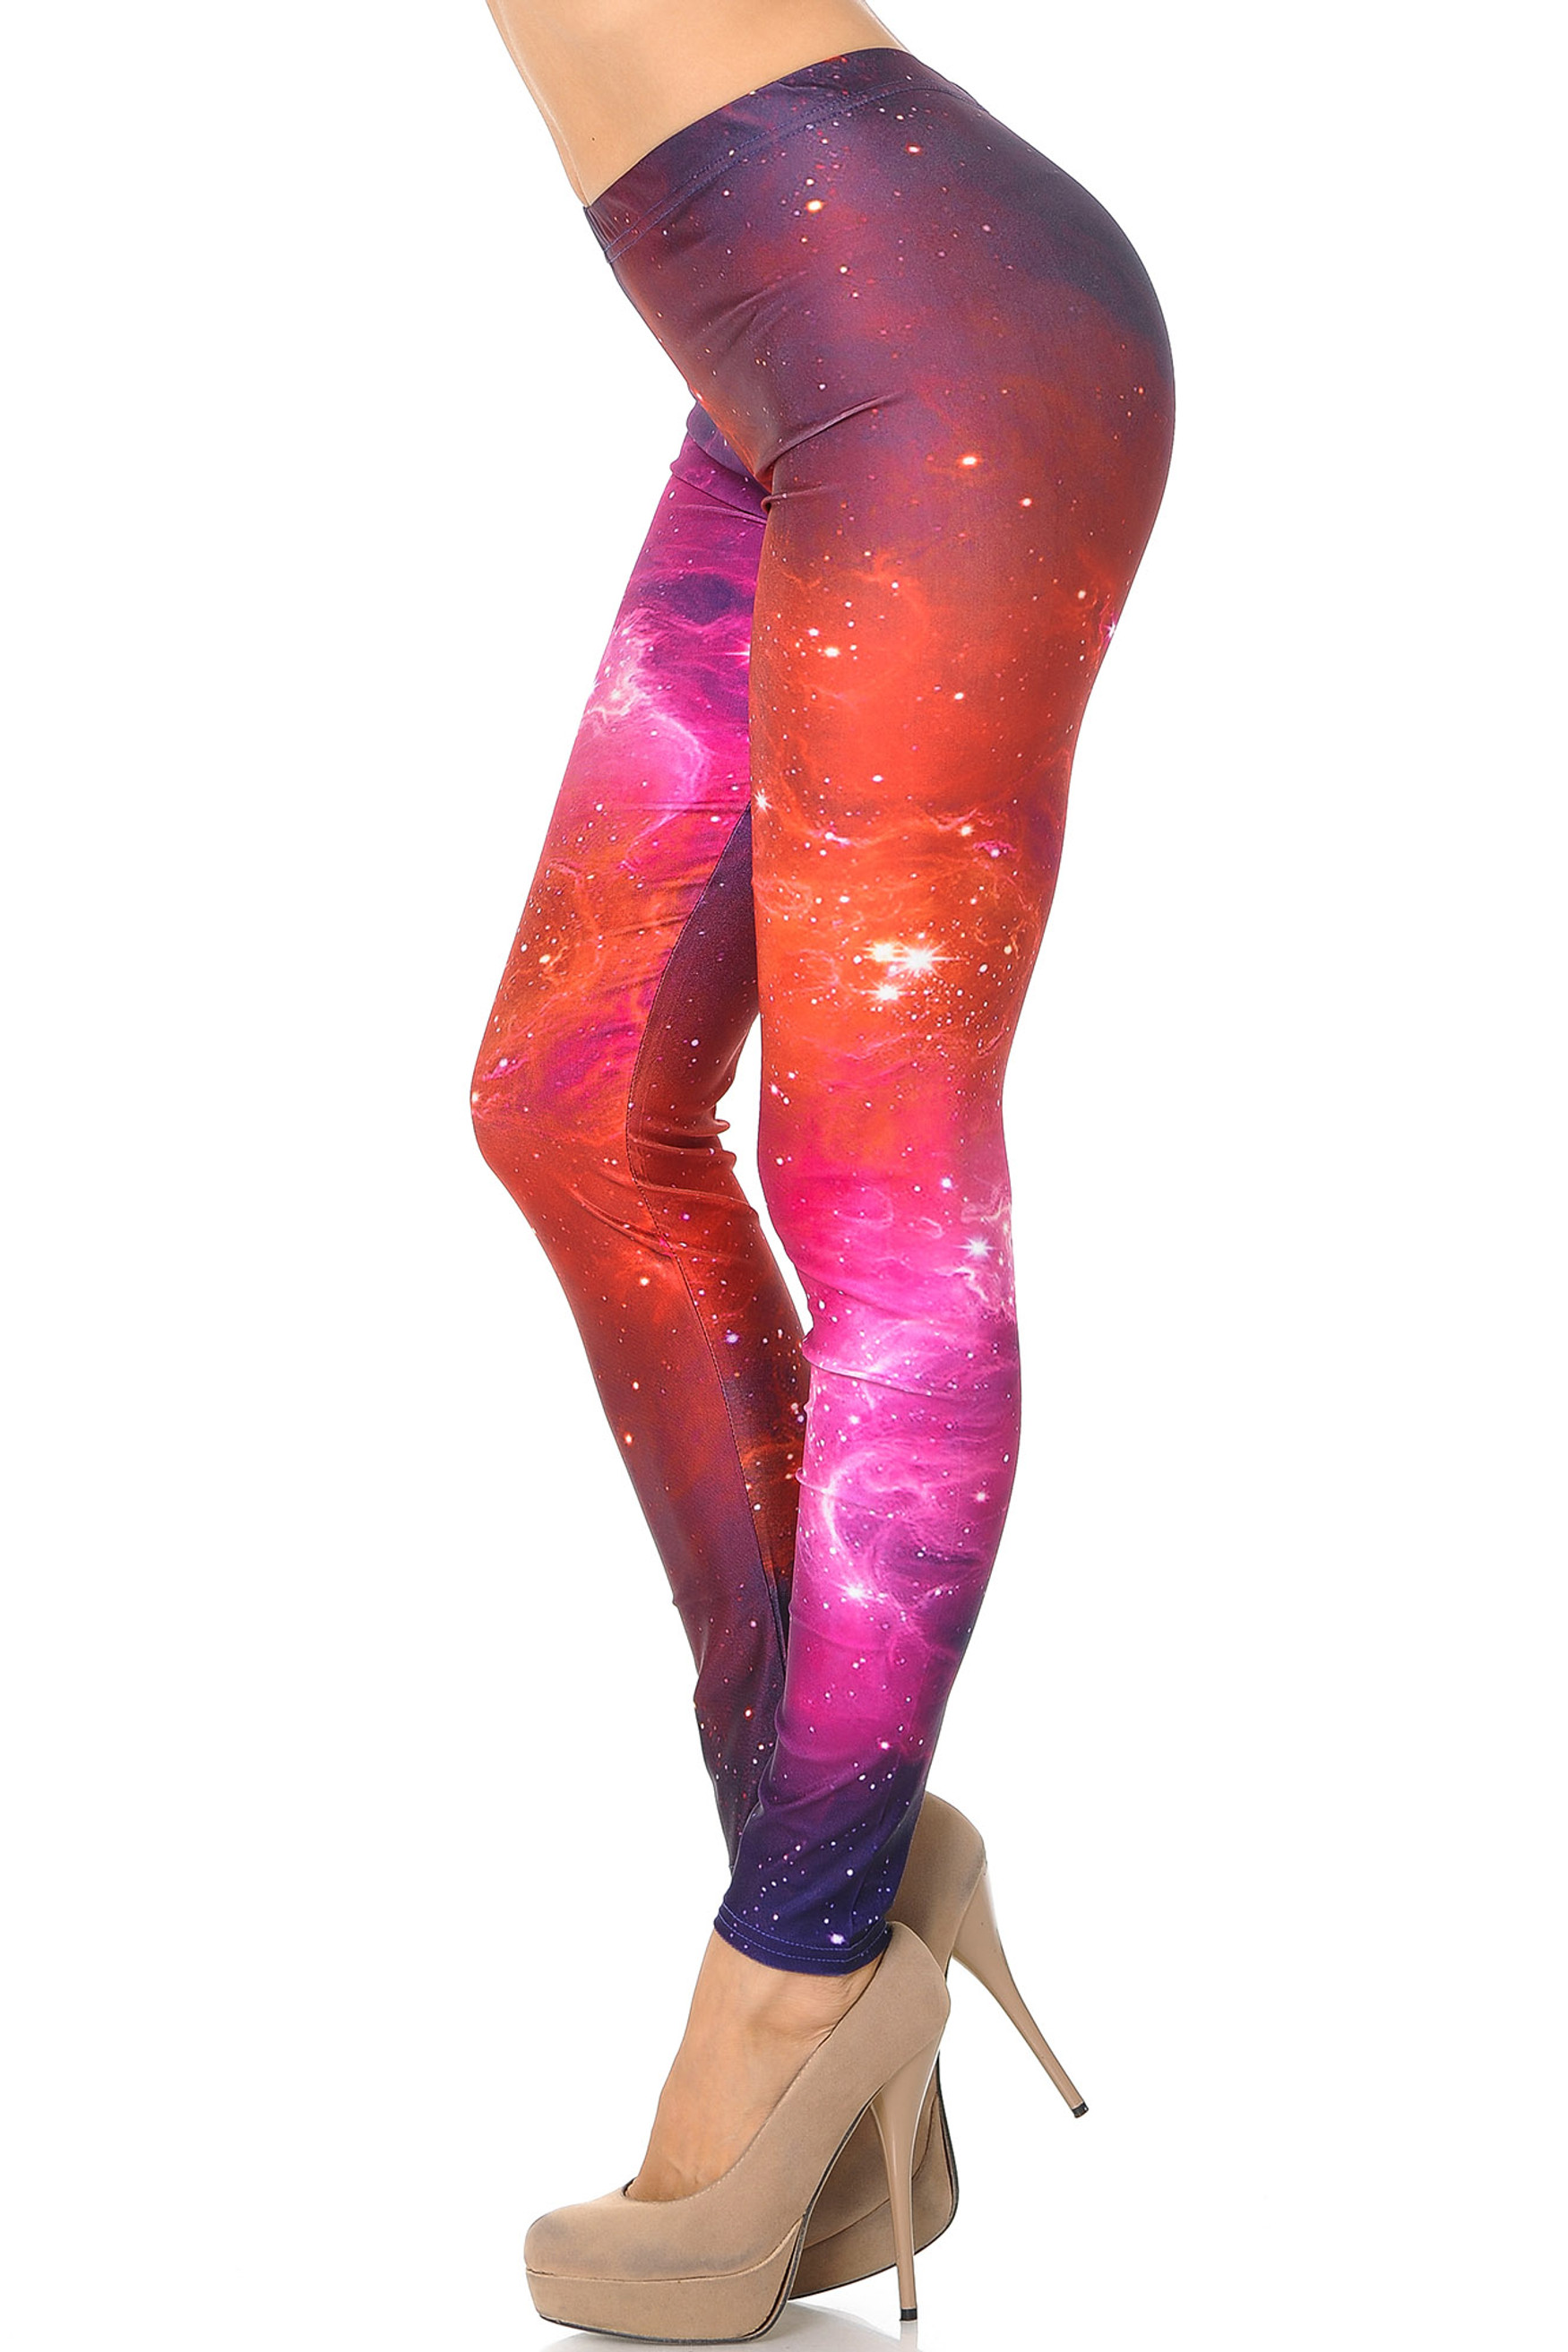 Galactic Blast Galaxy Leggings